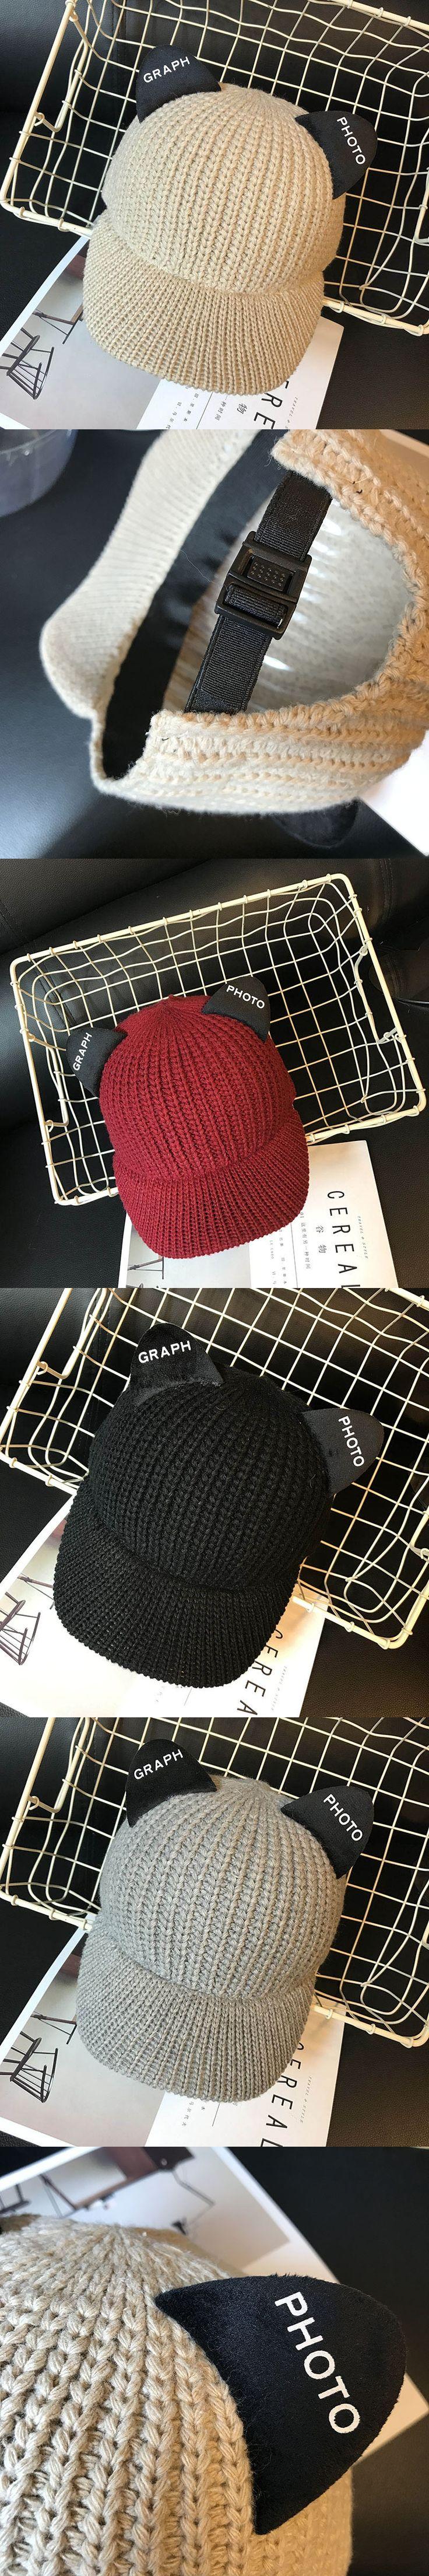 Fasshion Women's Hat Korean Style Winter Knitted Cap Cute Cat Ear Cap with Letter Autumn New Casual Men Baseball Caps HT035